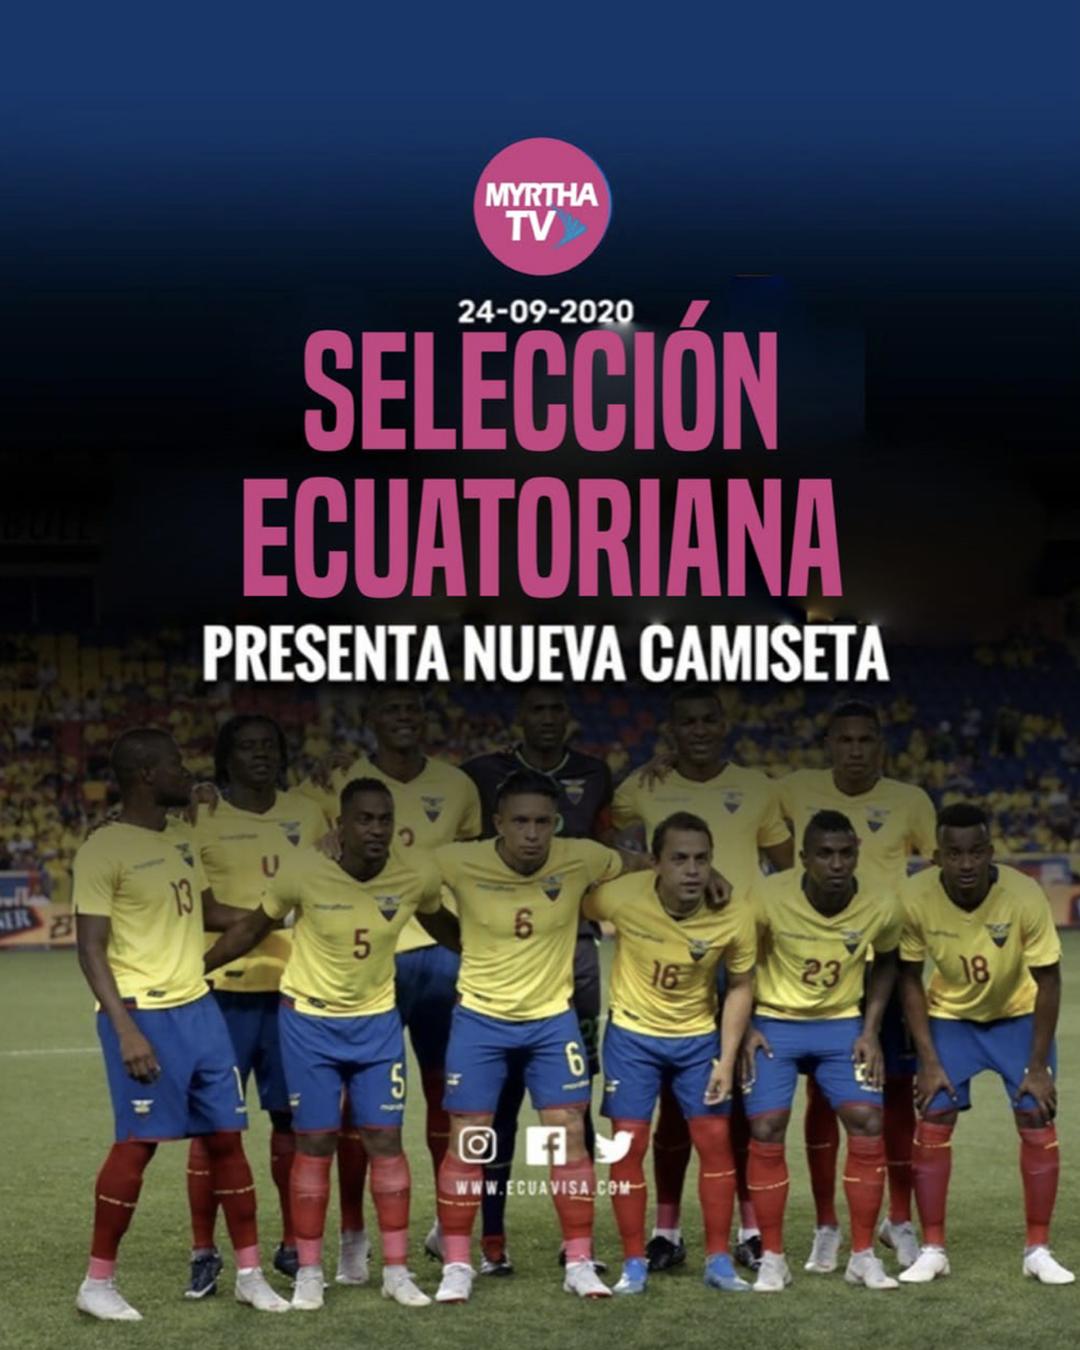 SELECCION ECUATORIANA PRESENTA NUEVA CAMISETA